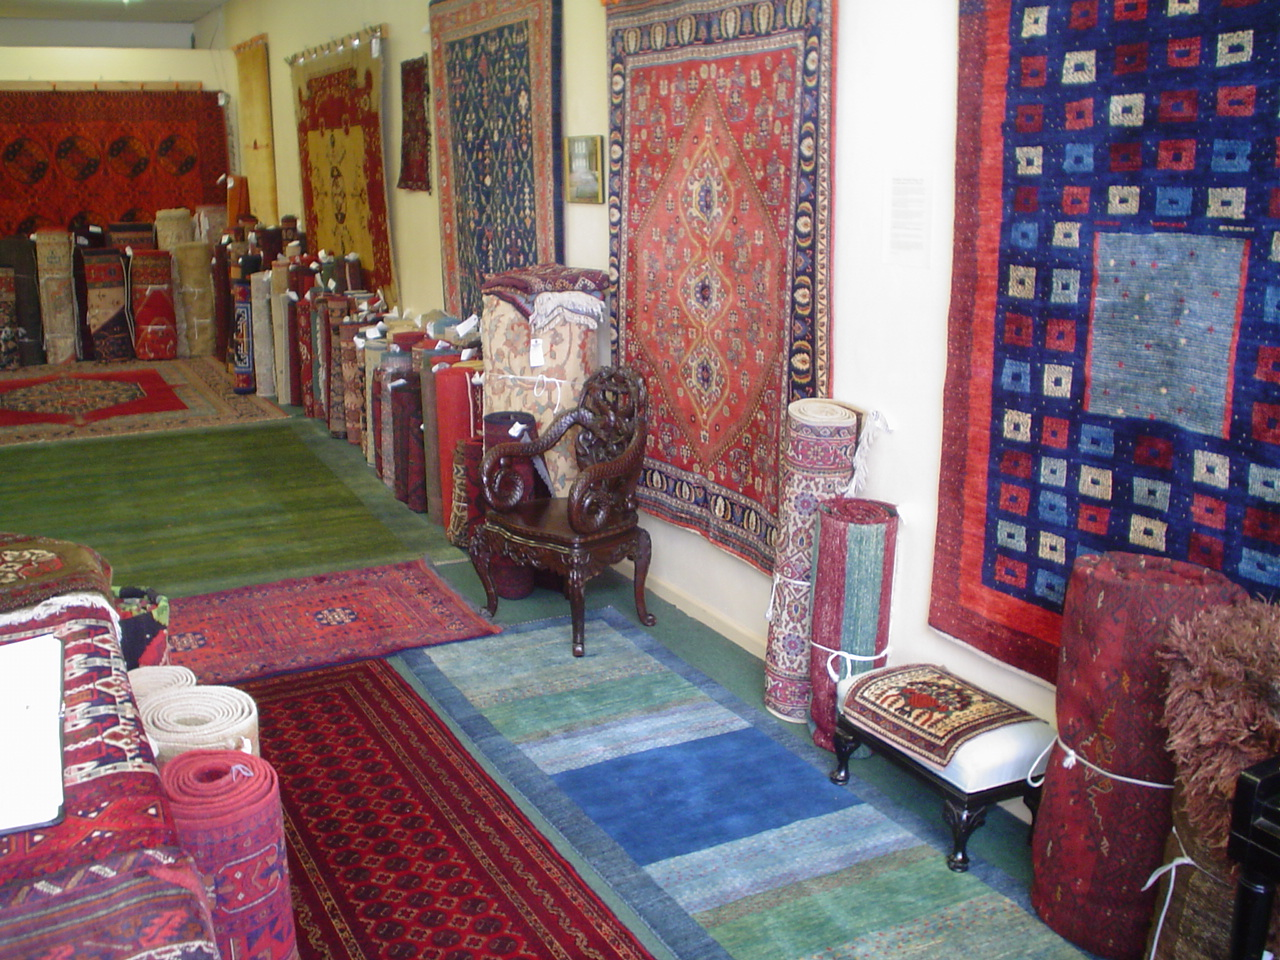 Paradise Oriental Rugs, Inc. in Sebastopol, CA.